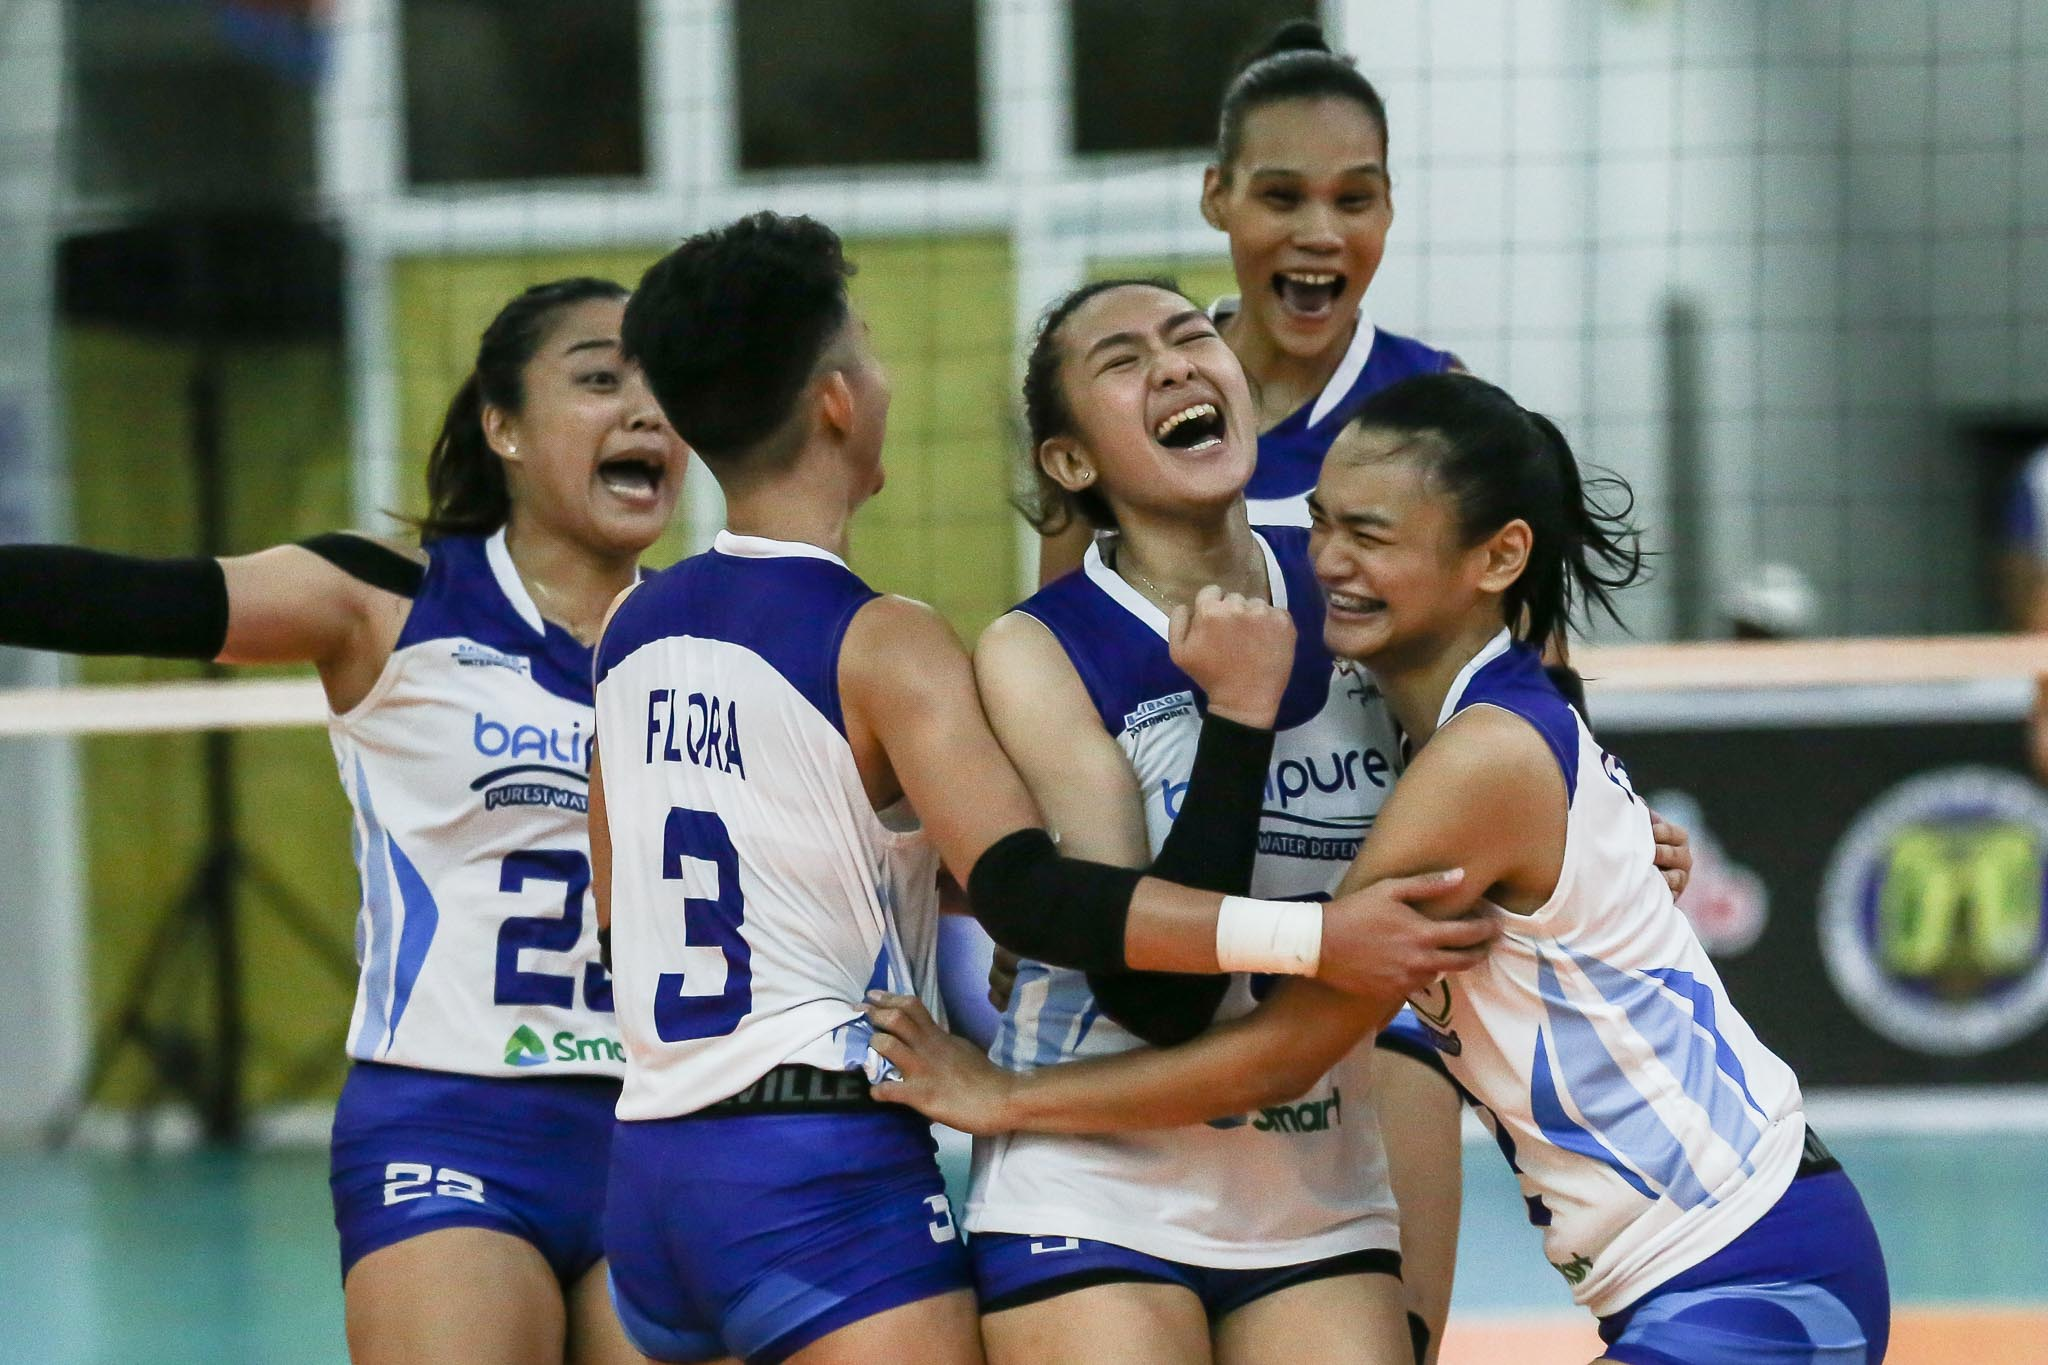 2021-PVL-Open-Cignal-vs-BaliPure-Gyra-Barroga-celebration Gyra Barroga's aces vs Cignal a product of off-season work with dad Edgar News PVL Volleyball  - philippine sports news